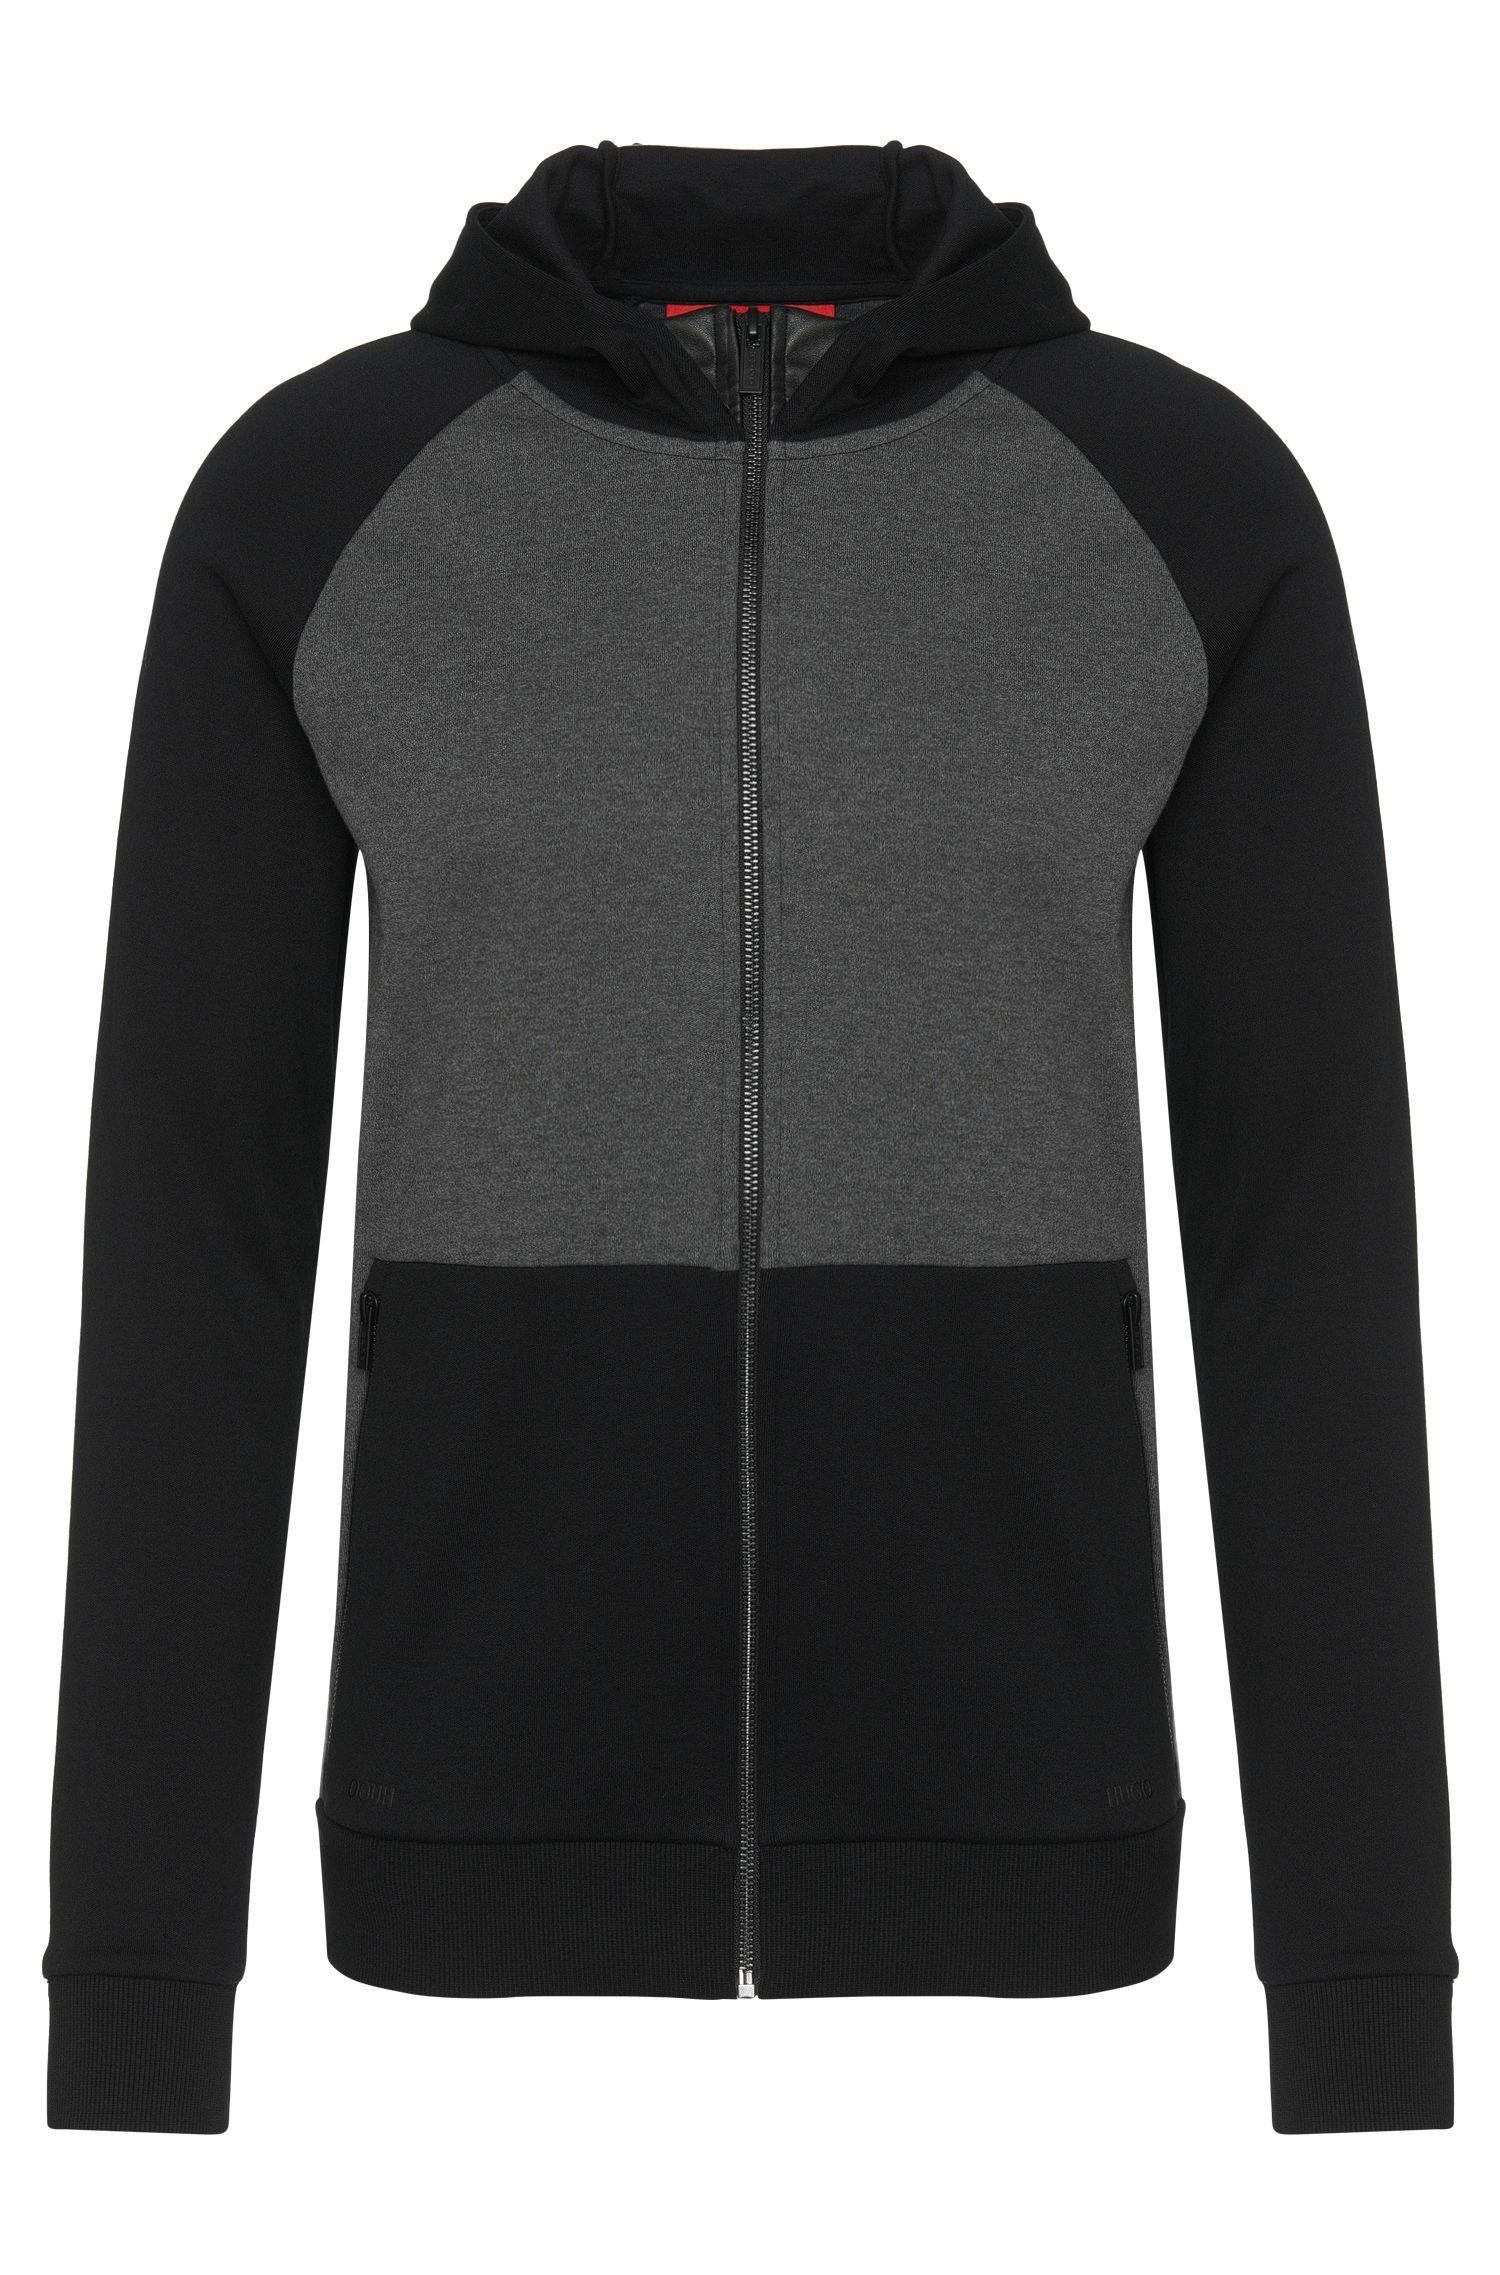 'Dapri' | Cotton Colorblocked Hooded Sweatshirt